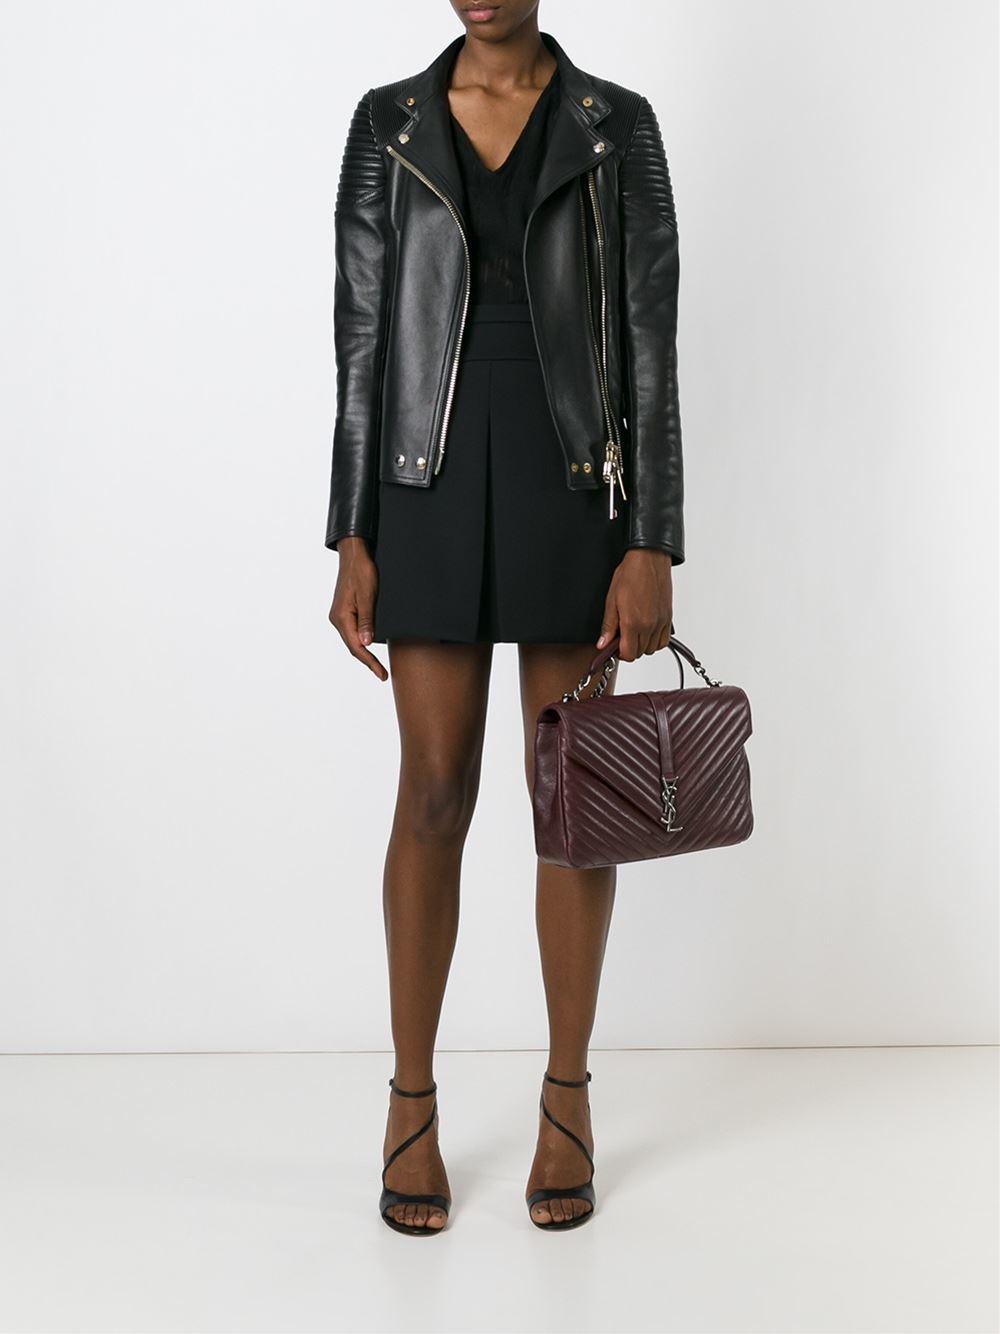 Yves Saint Laurent Large Monogram Matelasse Leather